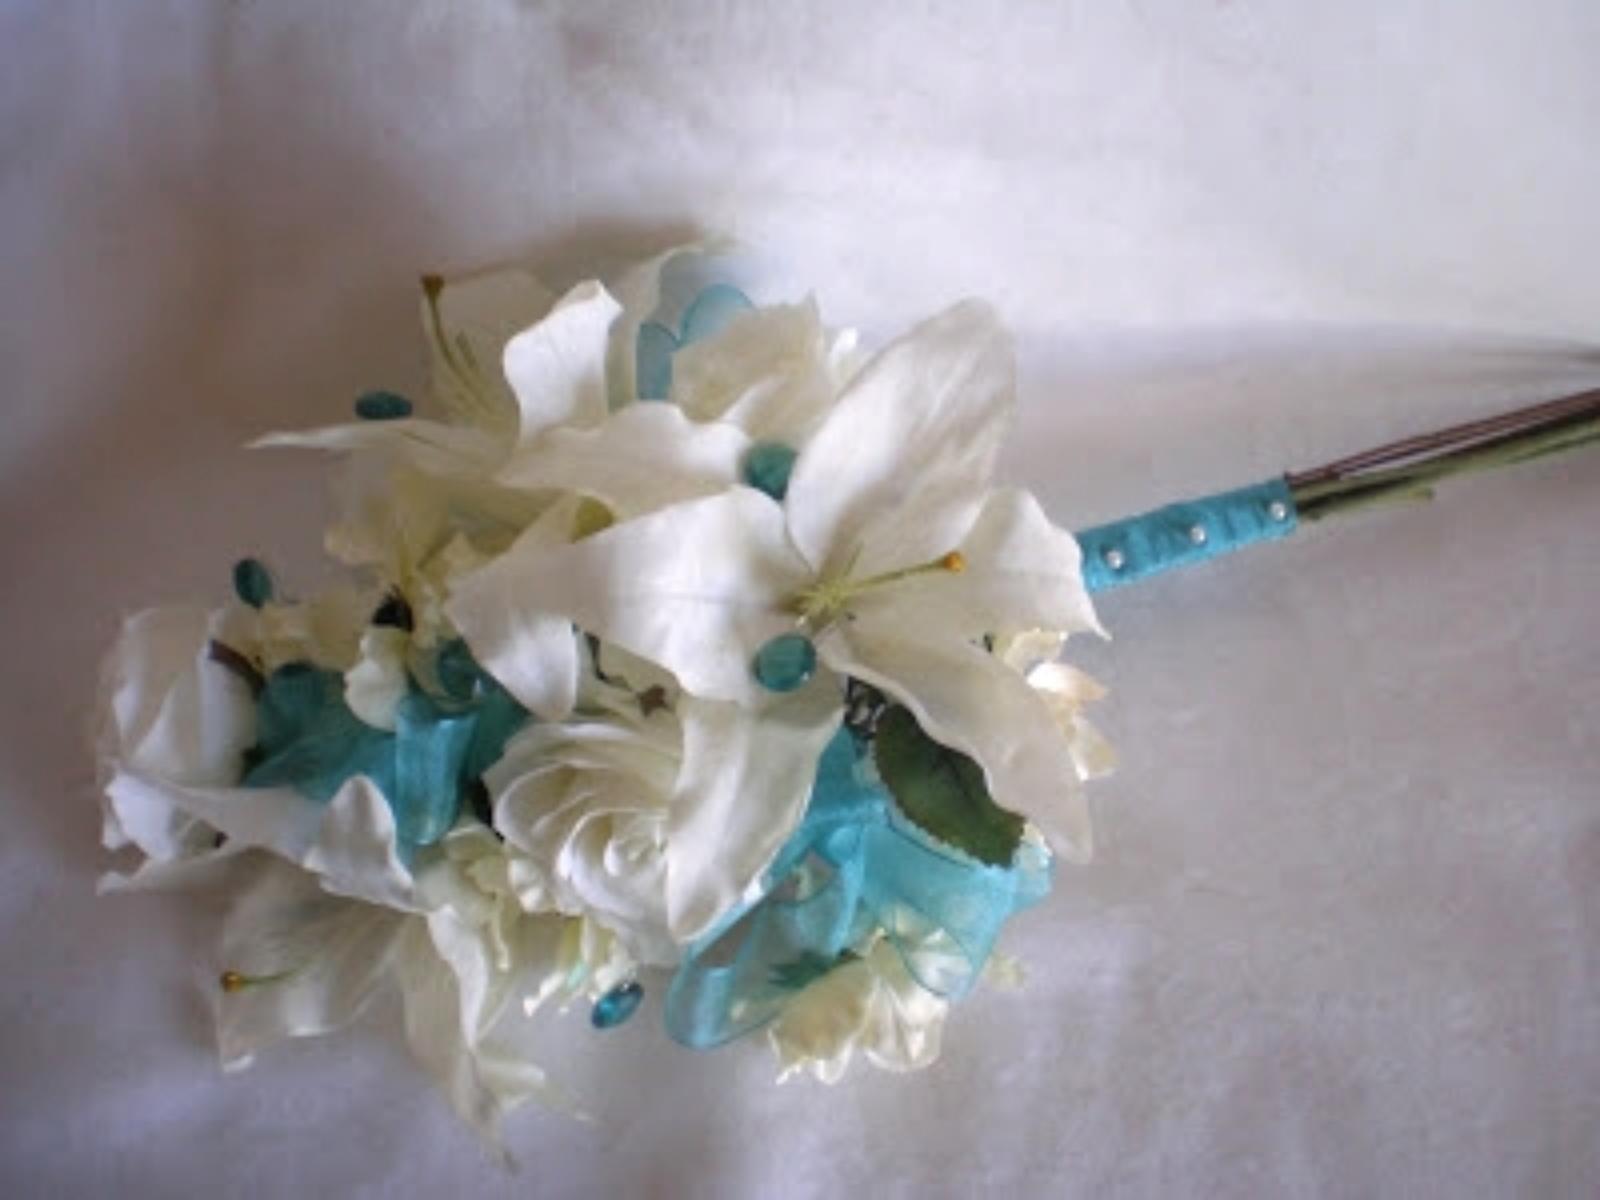 minneapolis-presentation-bridesmaid-bouquet-silk-wedding-flowers.jpg